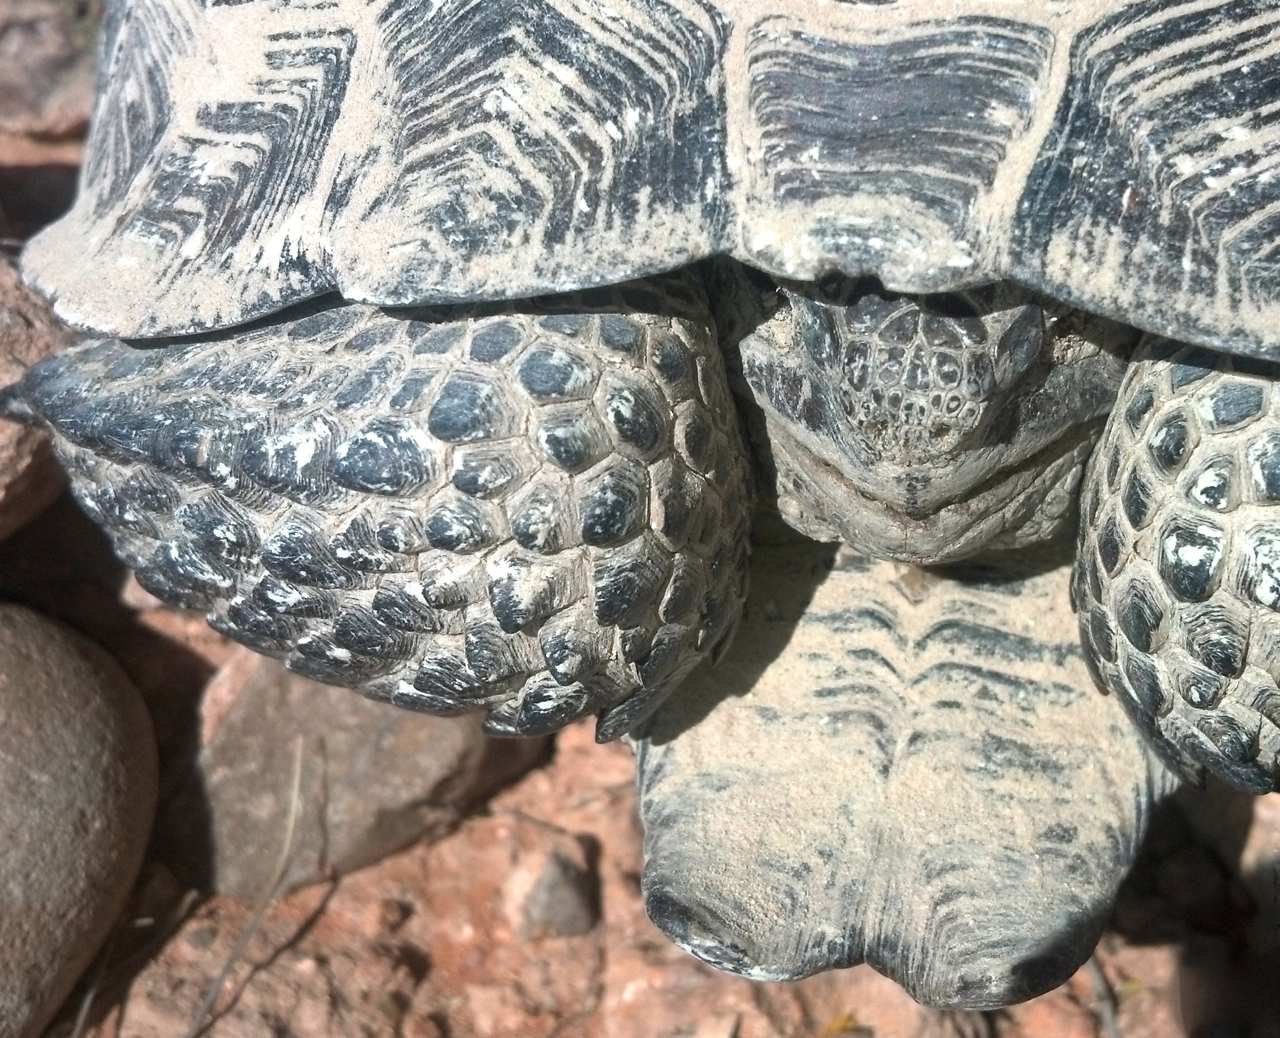 Desert tortoise St. George Photo by Joyce Kuzmanic, St. George News